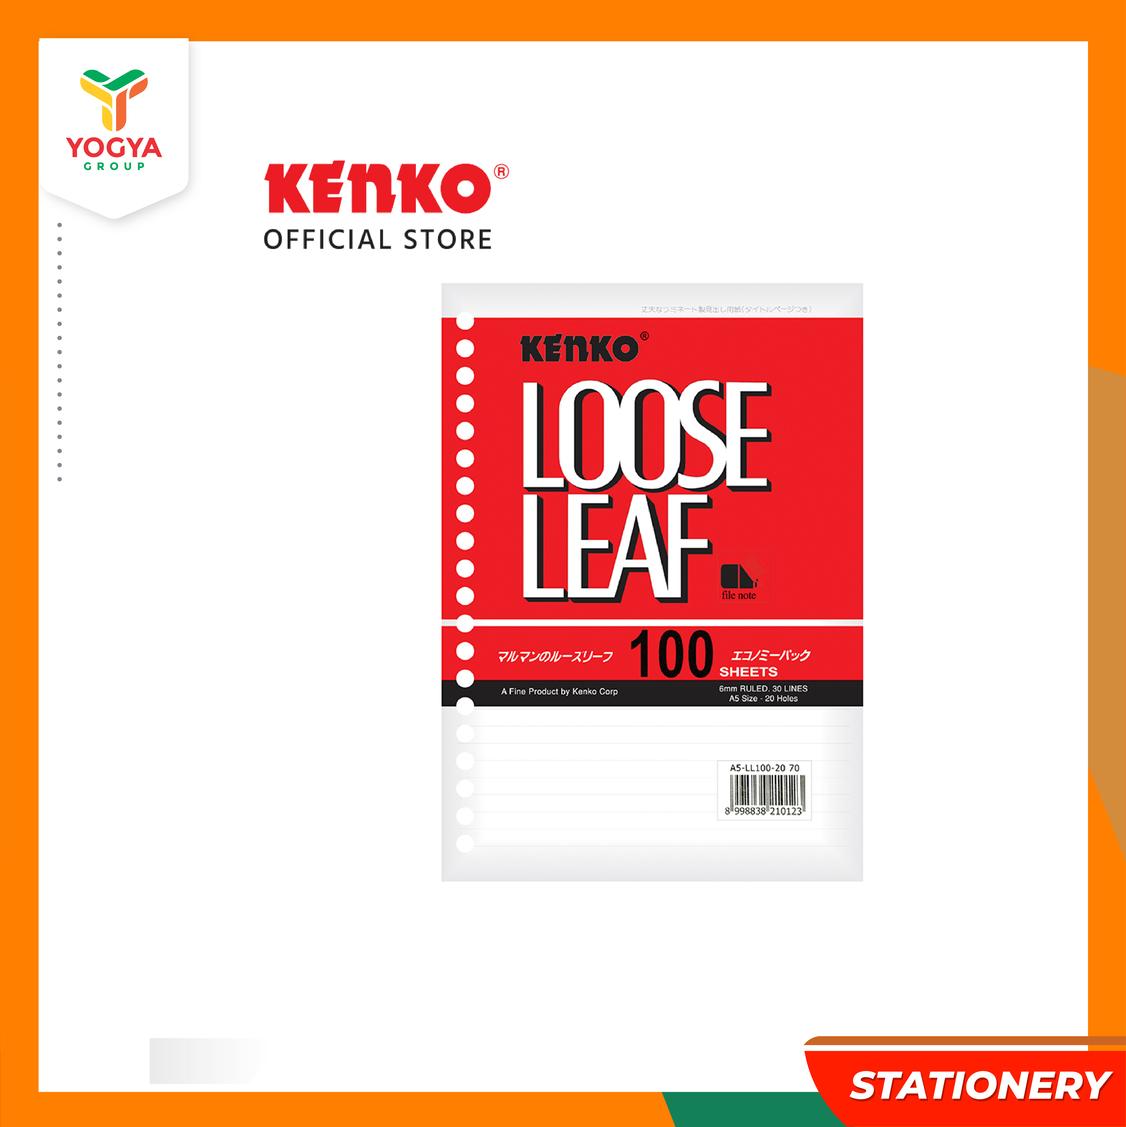 KENKO LOOSE LEAF A5-100